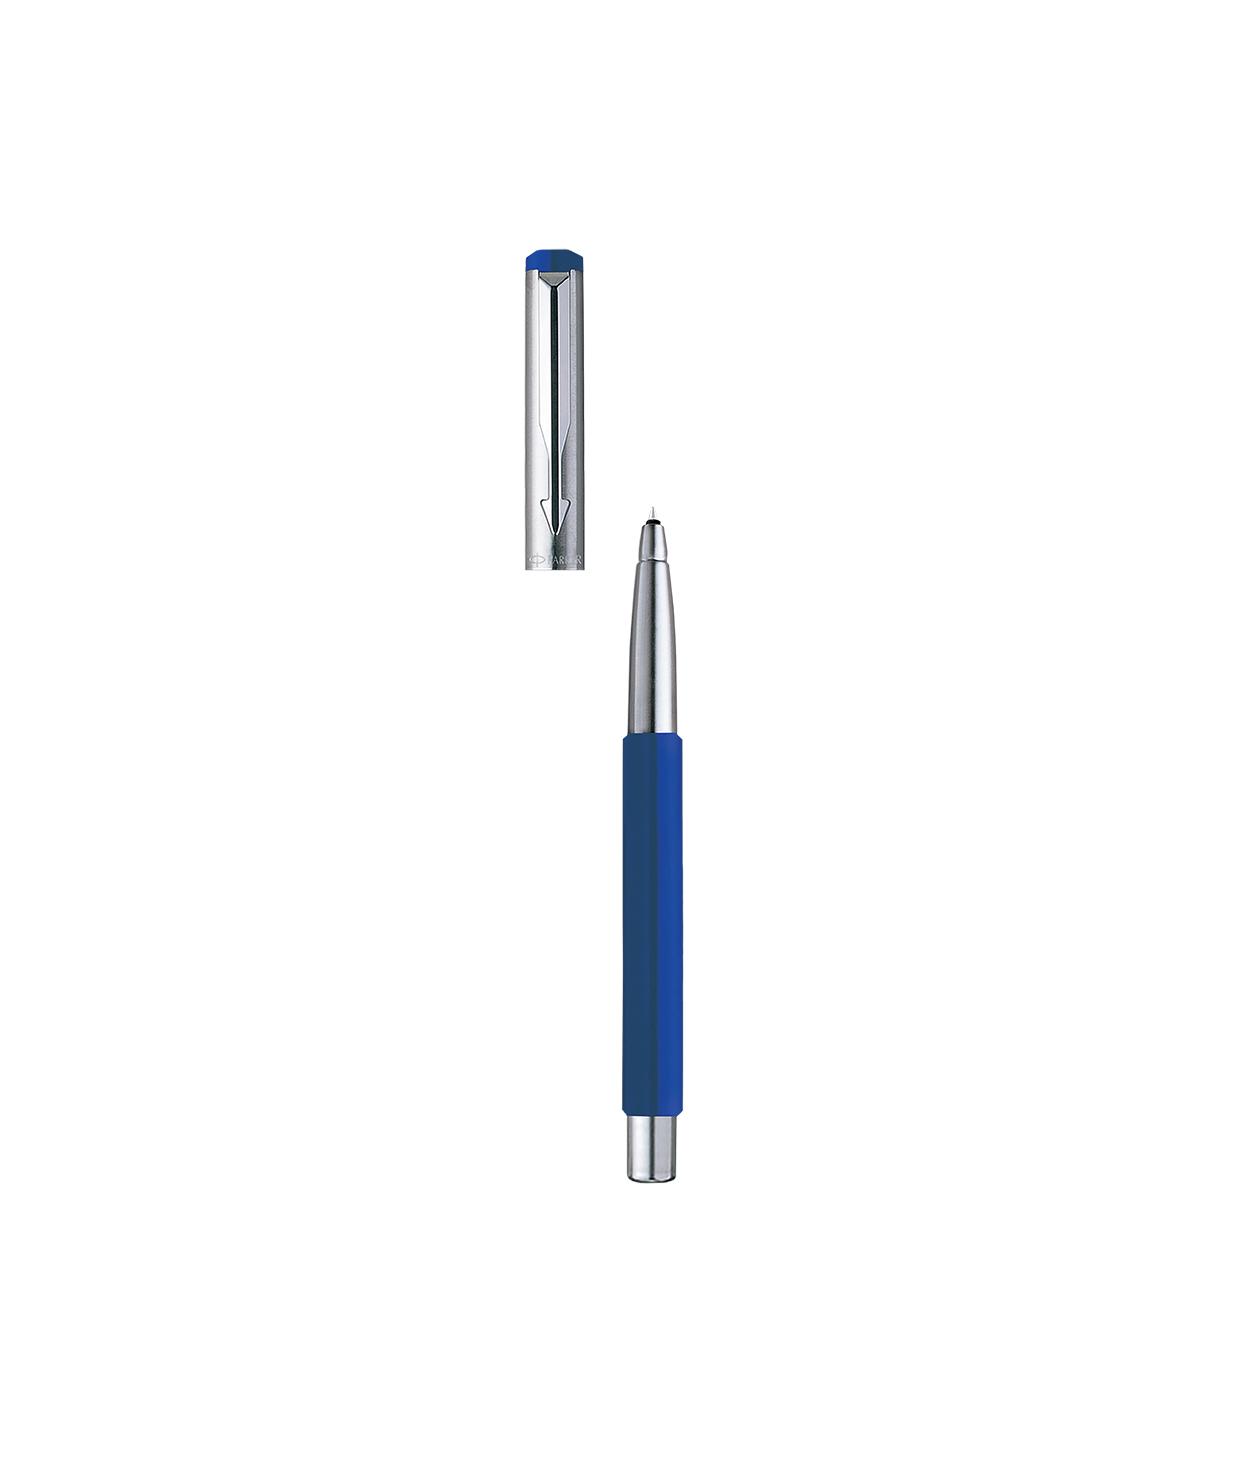 Refill Free Gift Parker Vector Mettalix Roller Ballpoint Pen Blue Colour